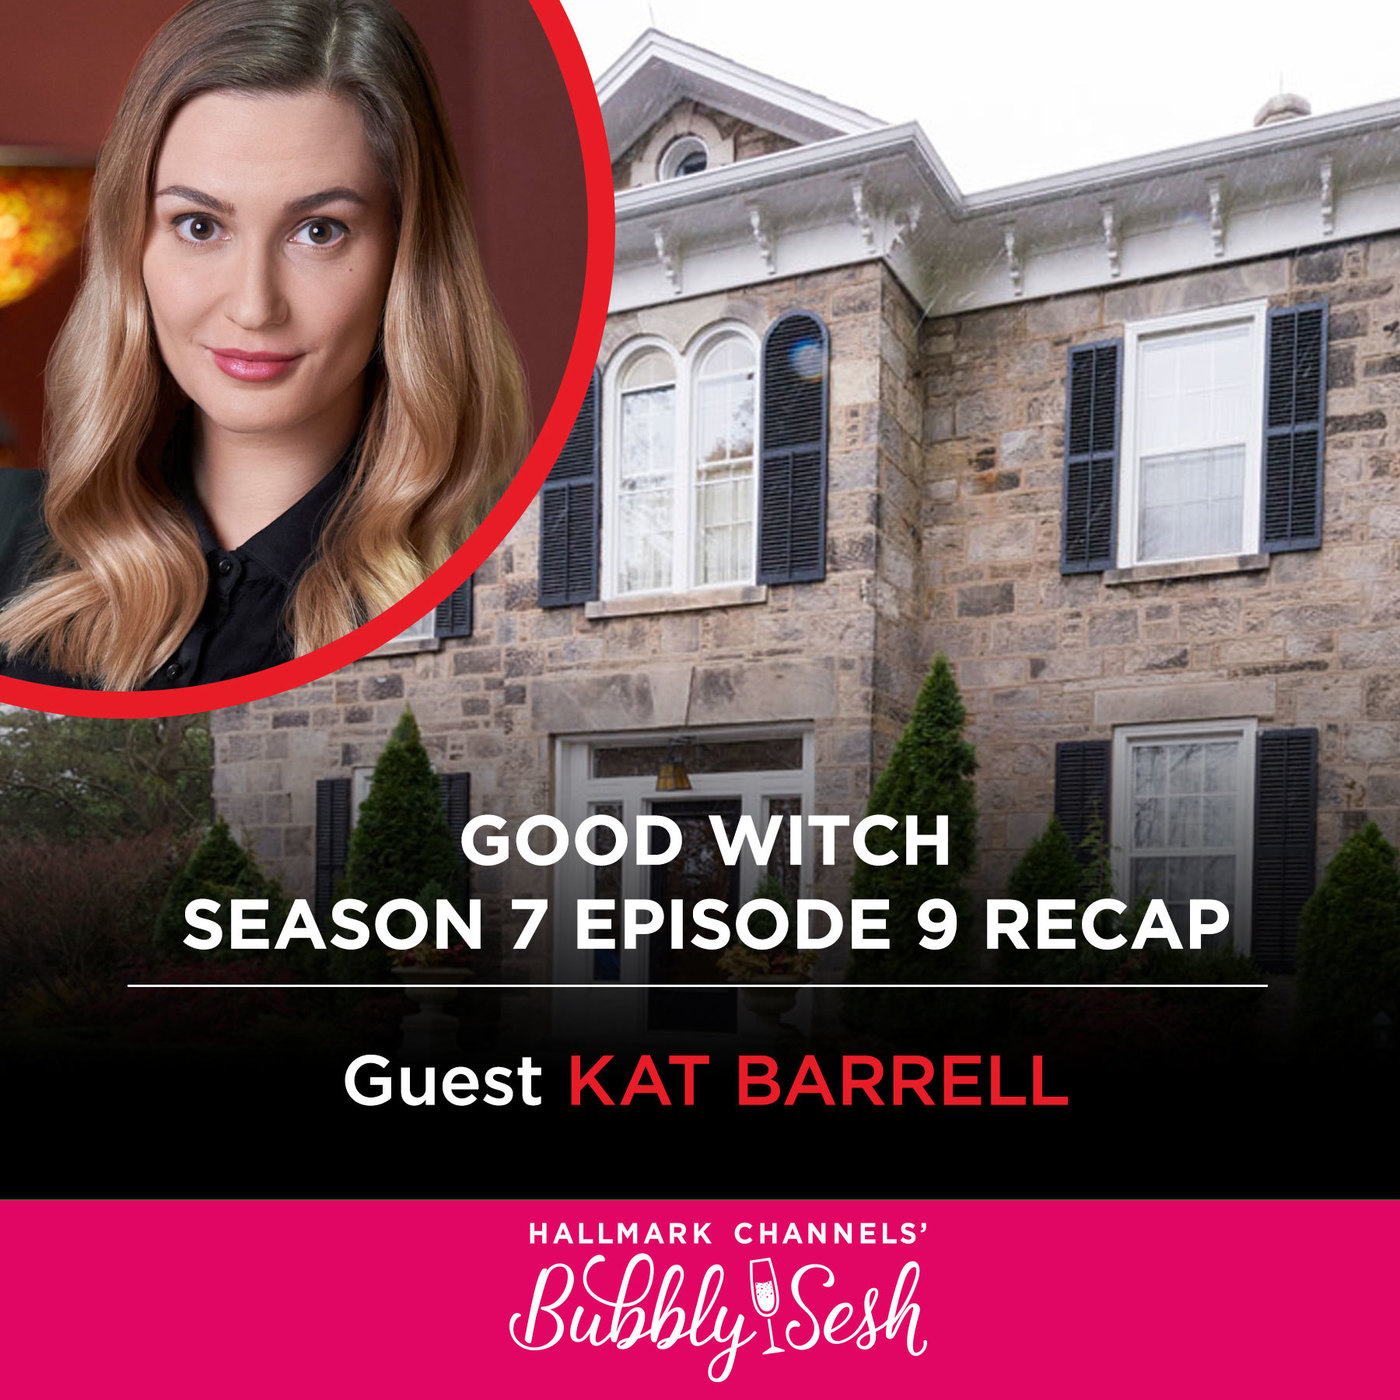 Good Witch Season 7 Episode 9 Recap with Guest Kat Barrell